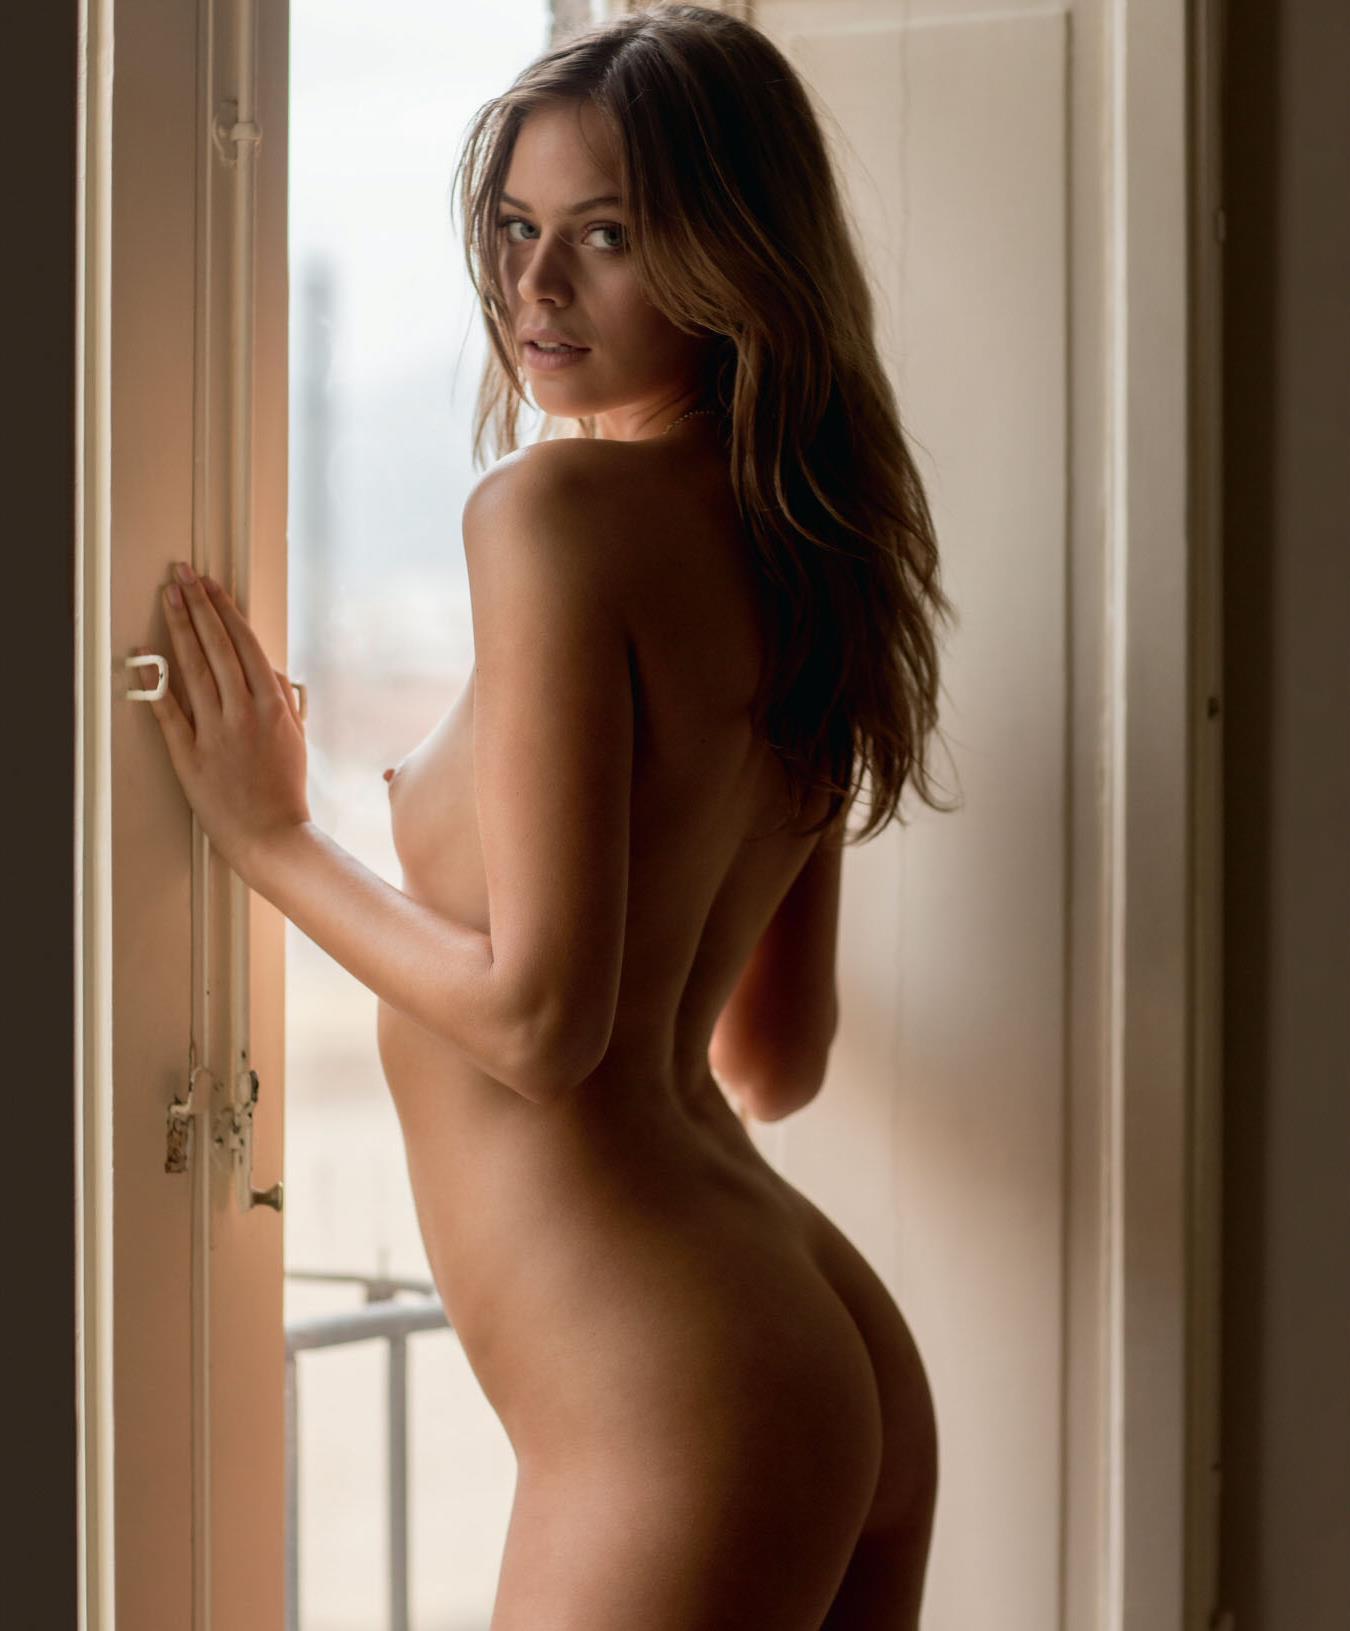 Alyssa Milano Nua playboy holly madison golaya - porn clips. comments: 2